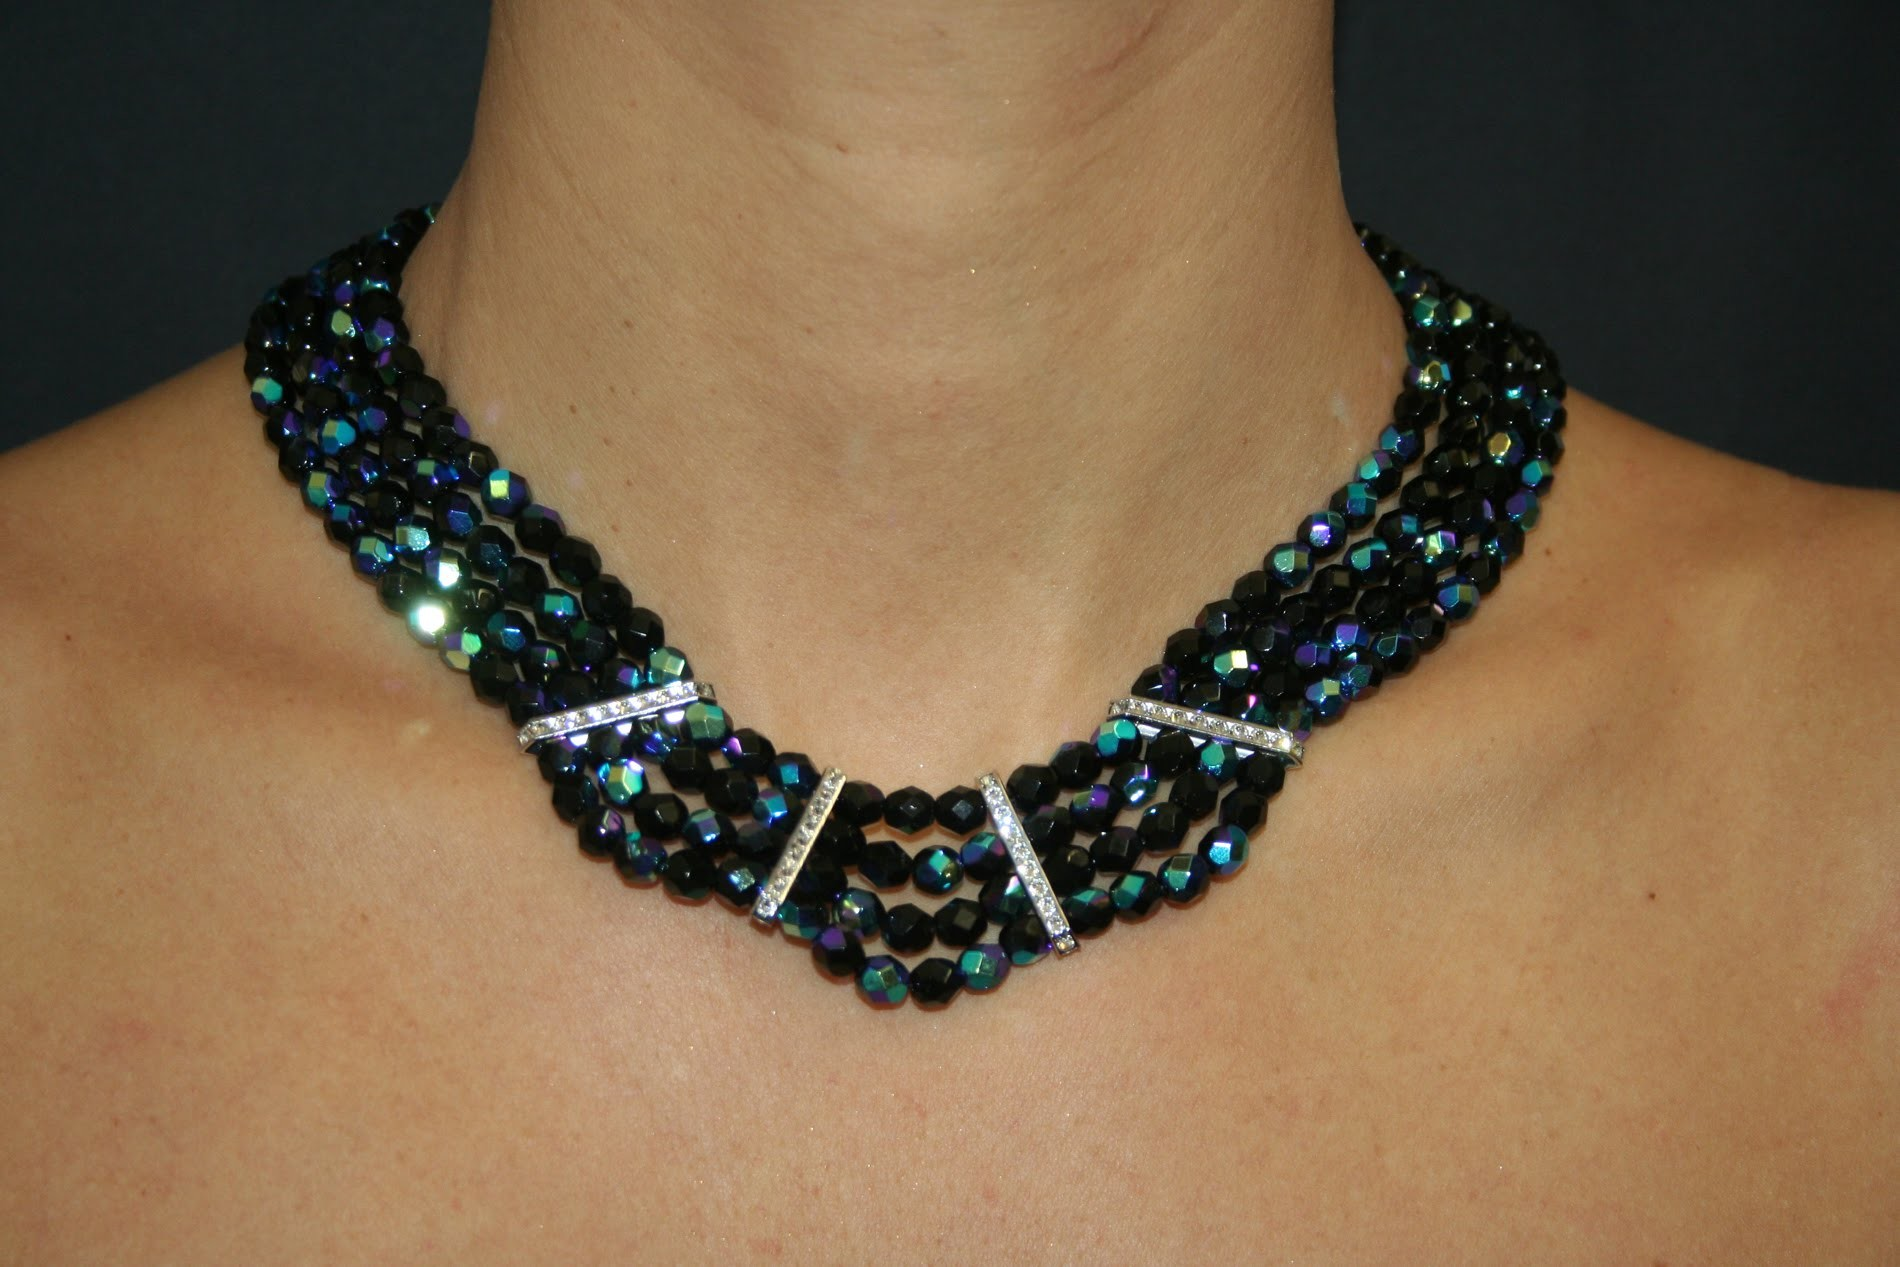 DIY Necklace with Swarovski Strass Bars and Fire Polished Beads - www.perlinebijoux.com